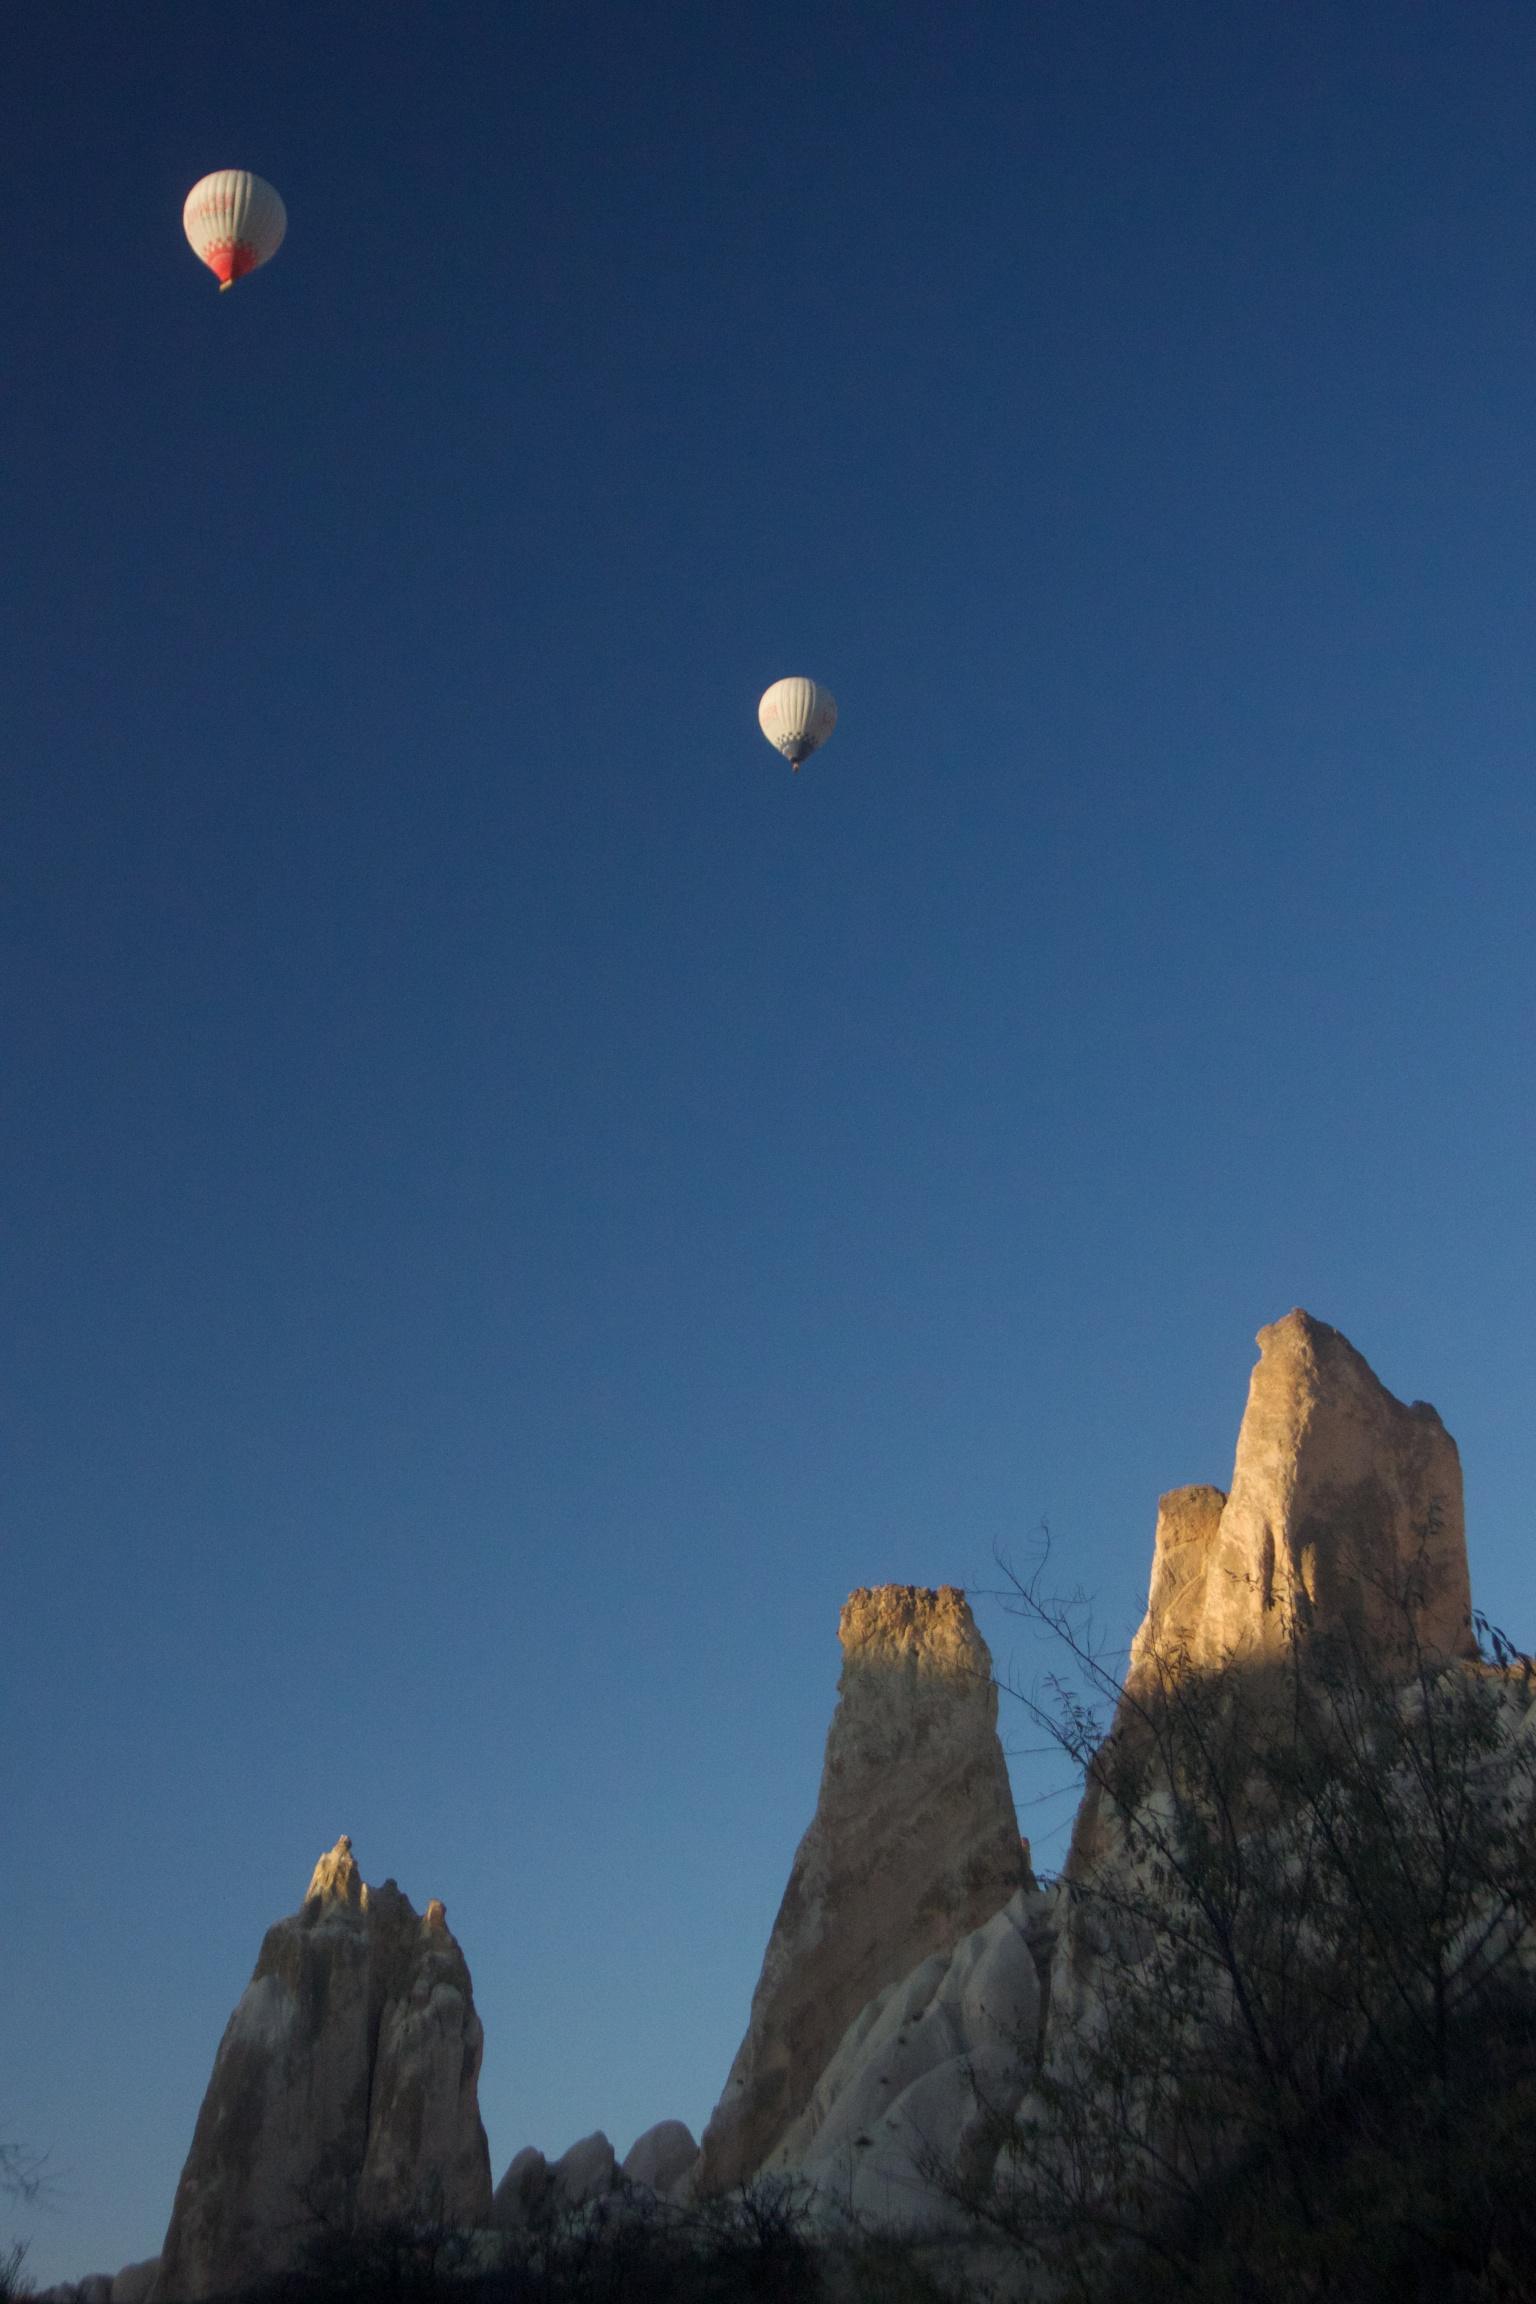 cappadocia-onthegroundD 12.jpg